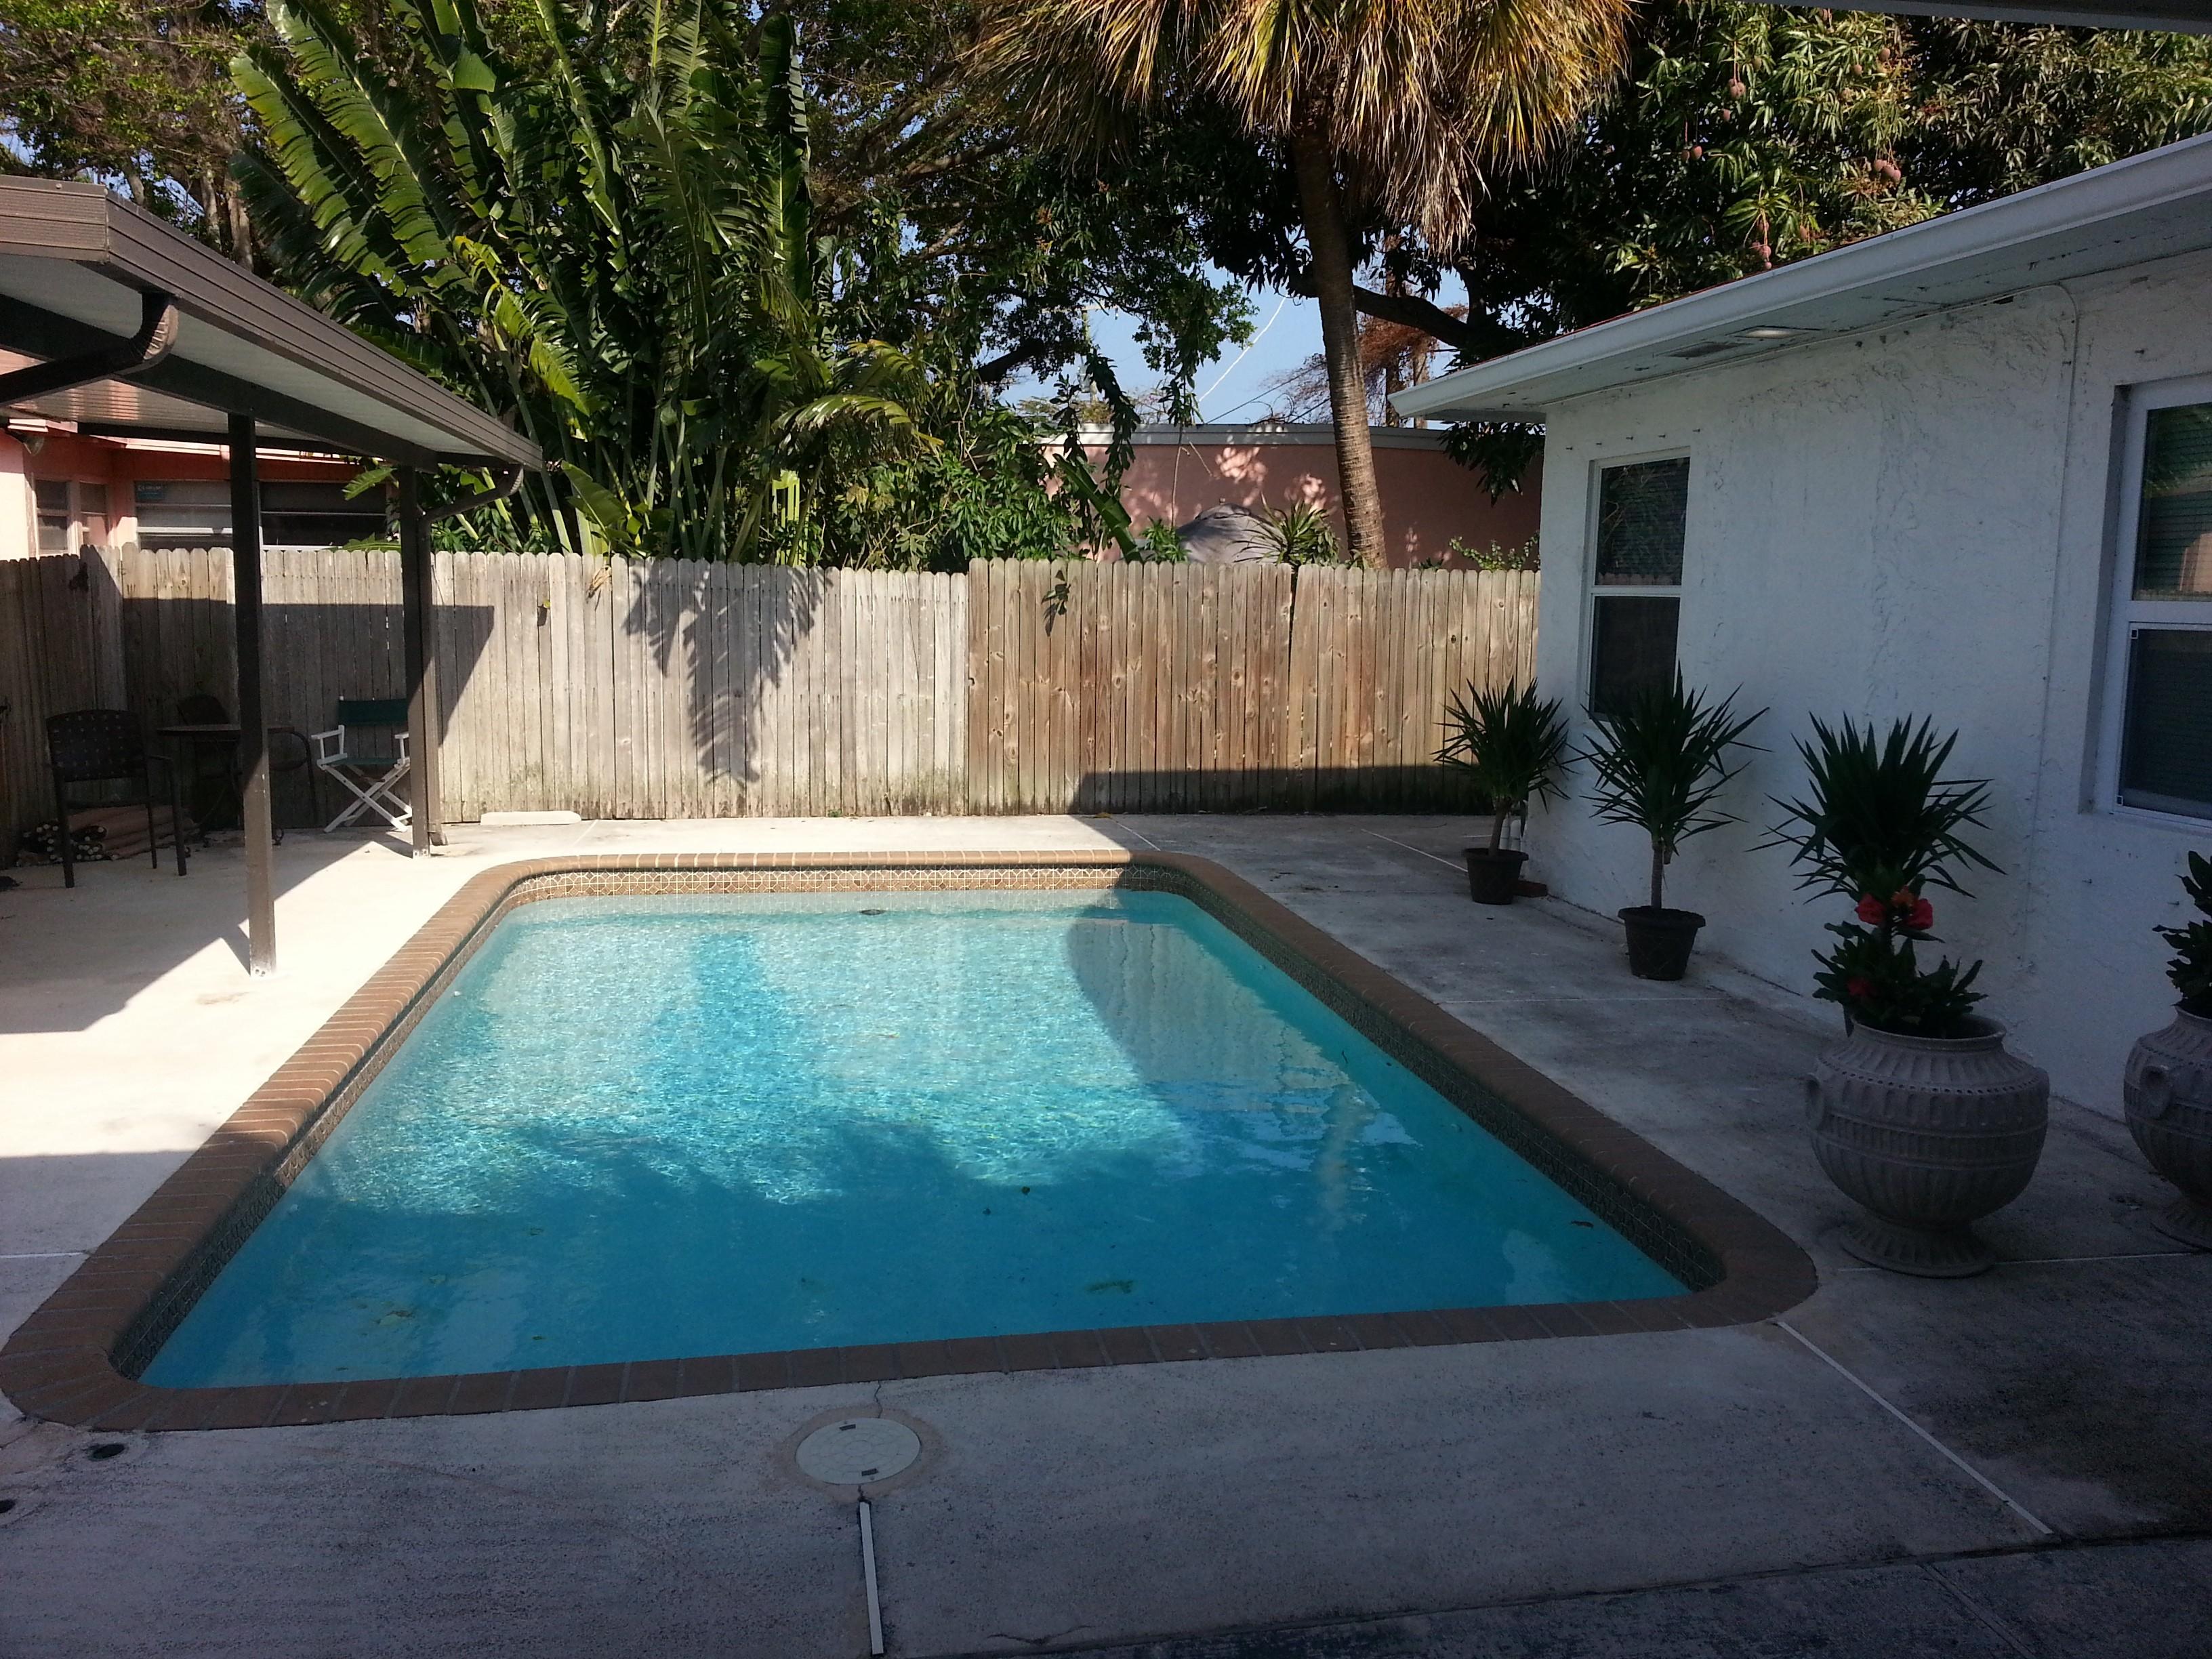 328 1 2 monroe dr west palm beach fl 33405 1 bedroom - 1 bedroom apartments west palm beach ...